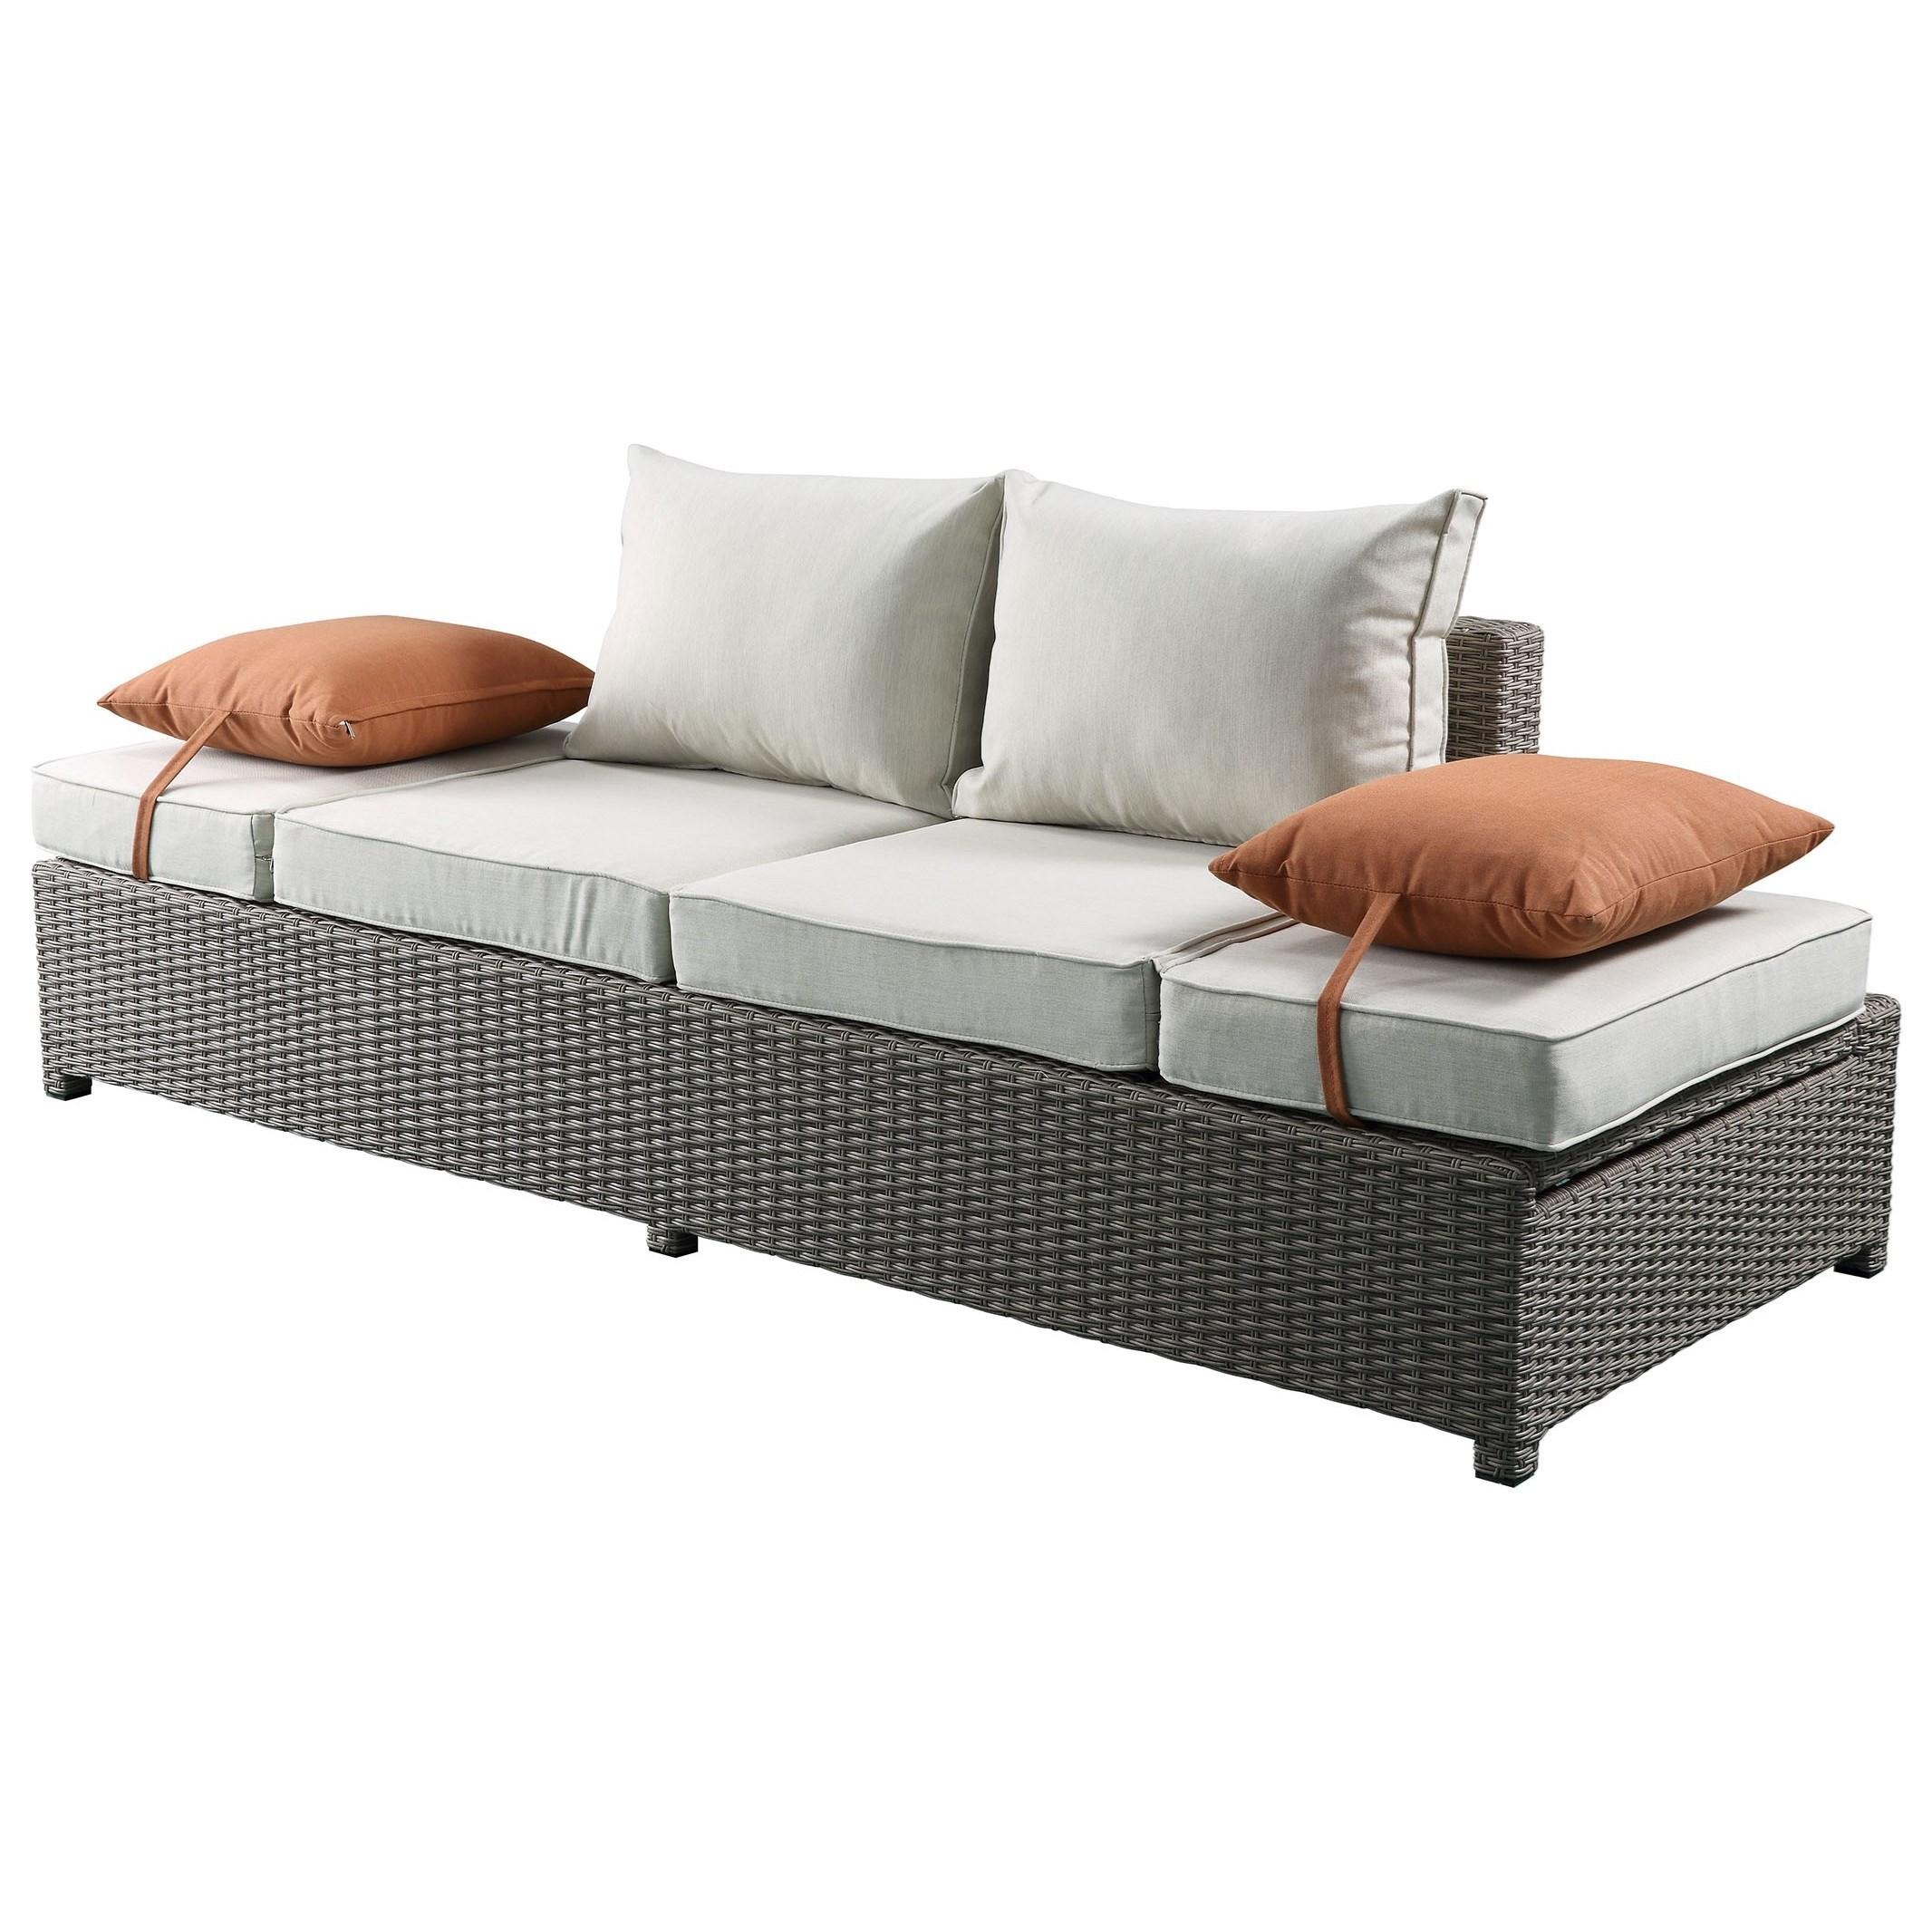 Patio Sofa & Ottoman w/2 Pillows